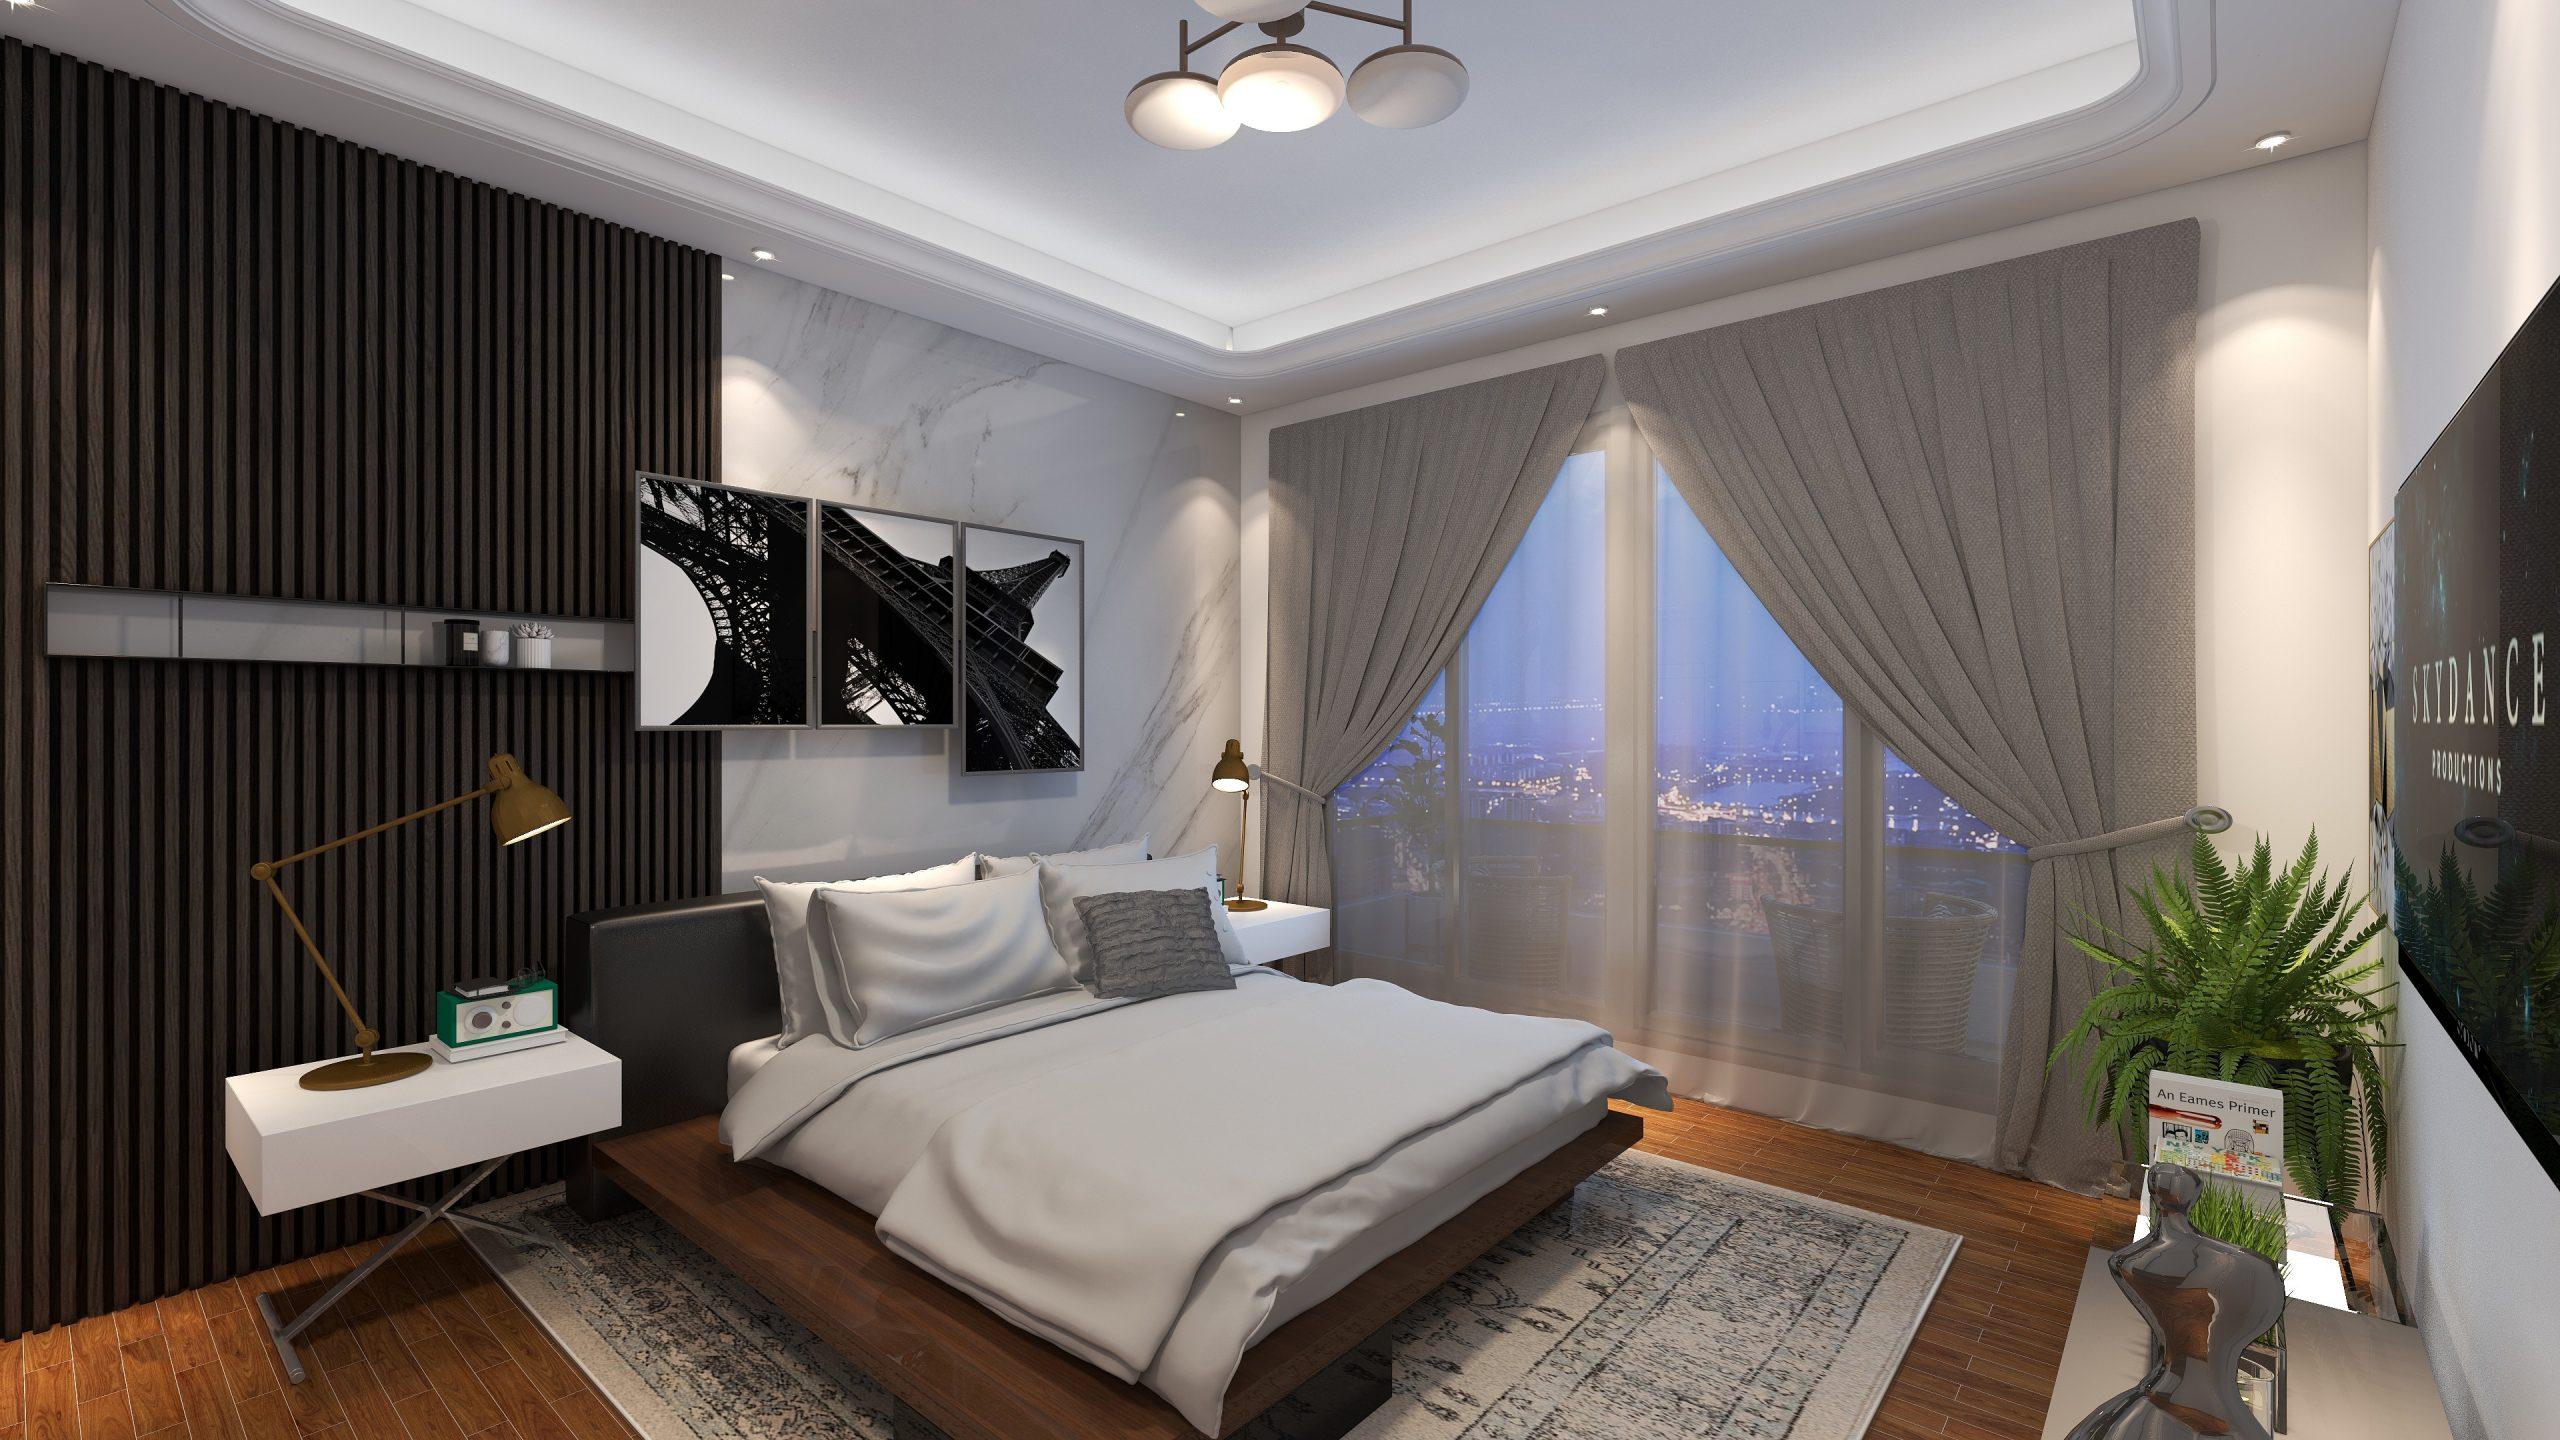 BED ROOM 1 B